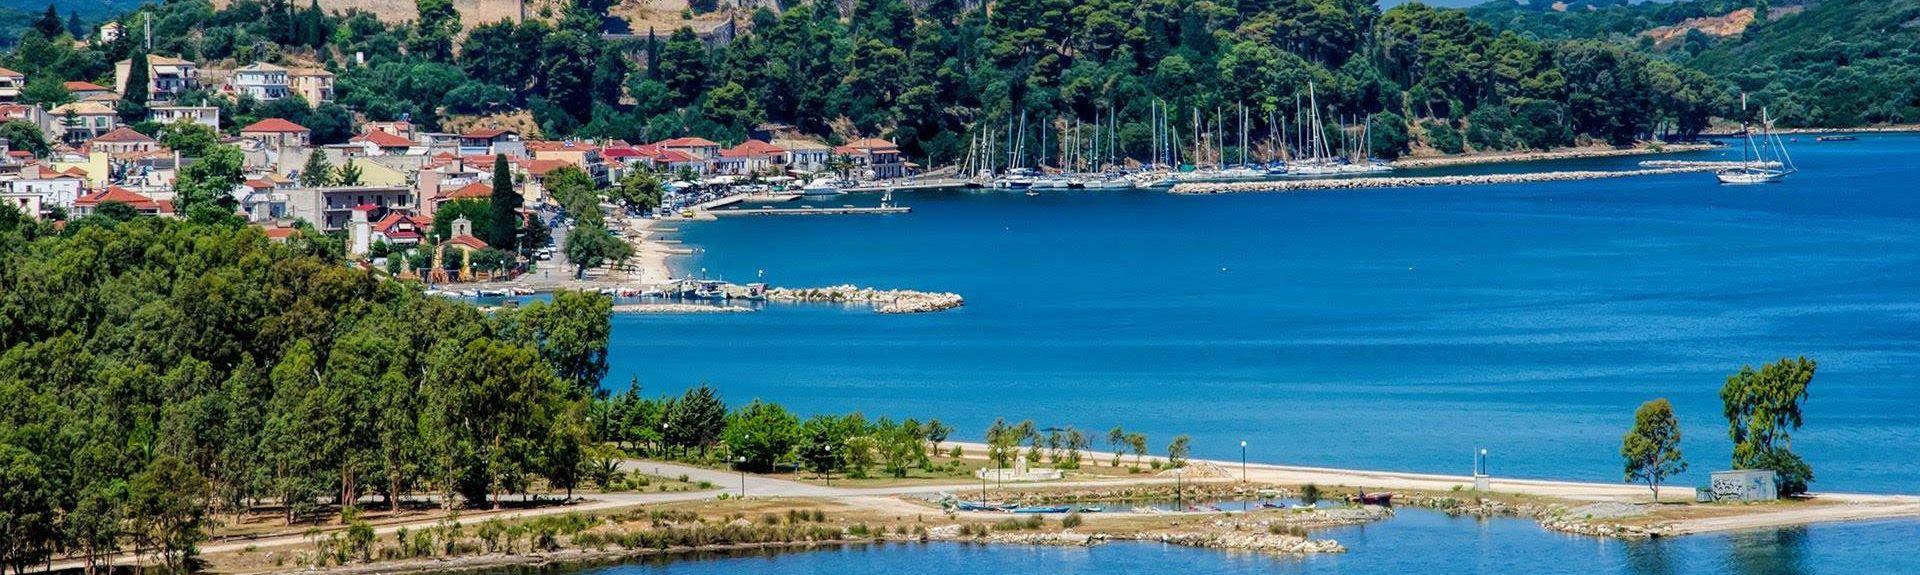 Amfilochia, Greece